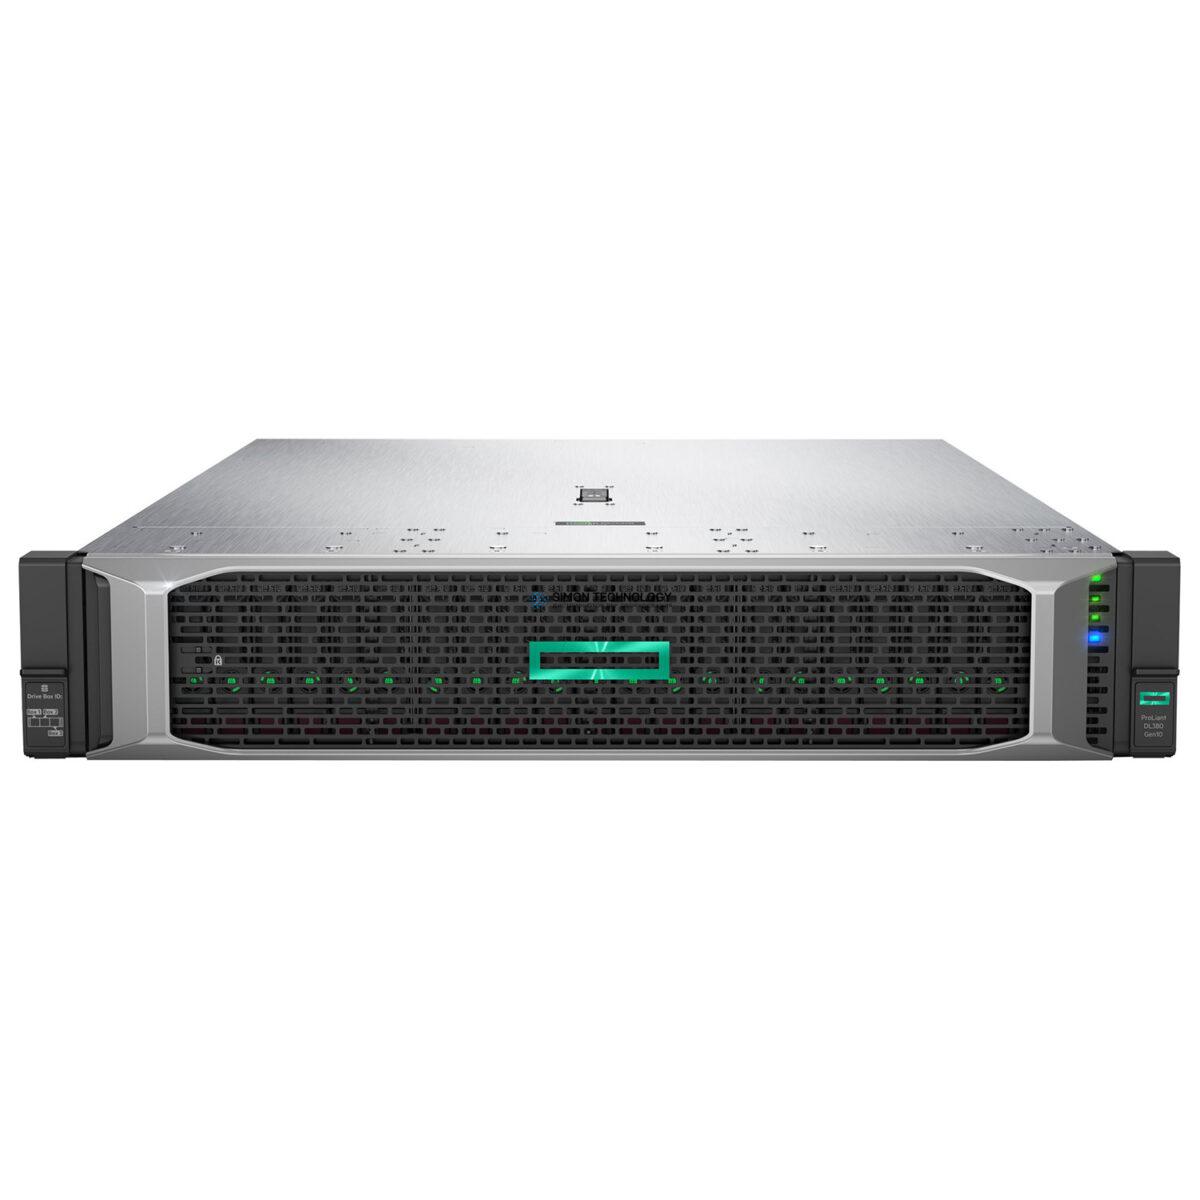 Сервер HPE ProLiant DL380 Gen10 4110 1P 16GB-R 8SFF (P05524-B21)